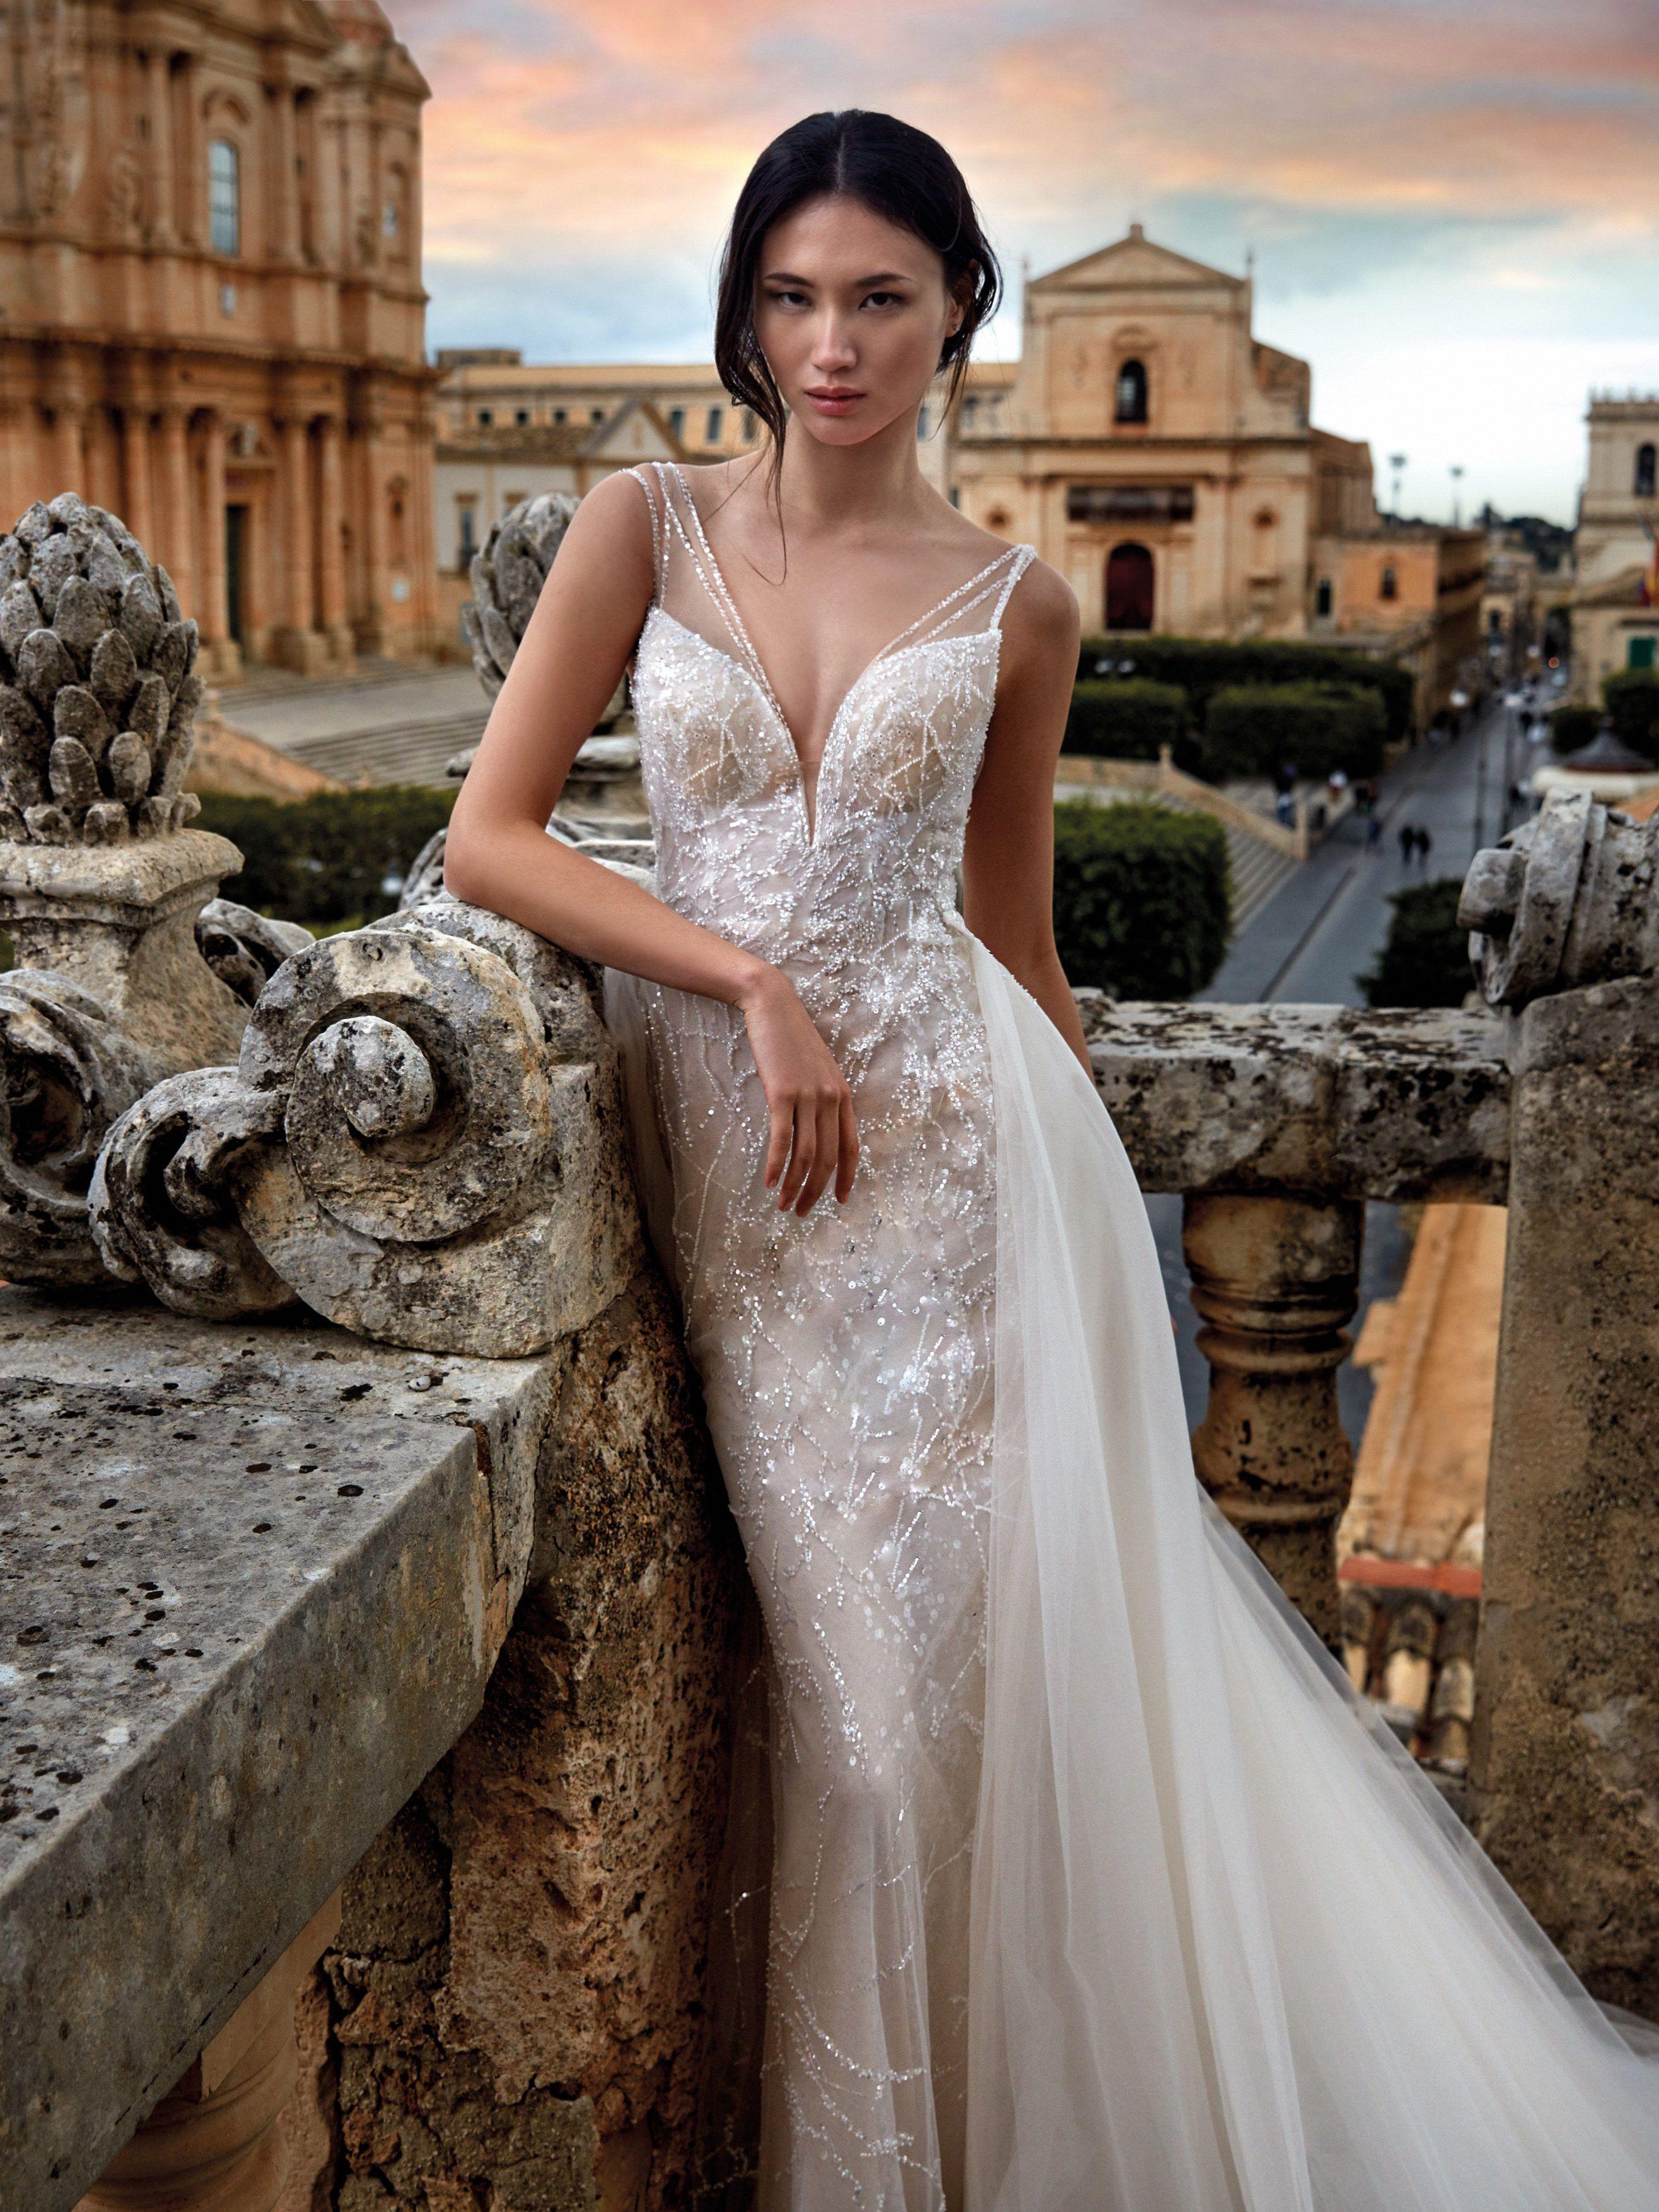 Mermaid Wedding Dress With Tulle Overskirt Wedding Dresses Simple Wedding Dress Boho Mermaid Wedding Dress [ 3508 x 2631 Pixel ]